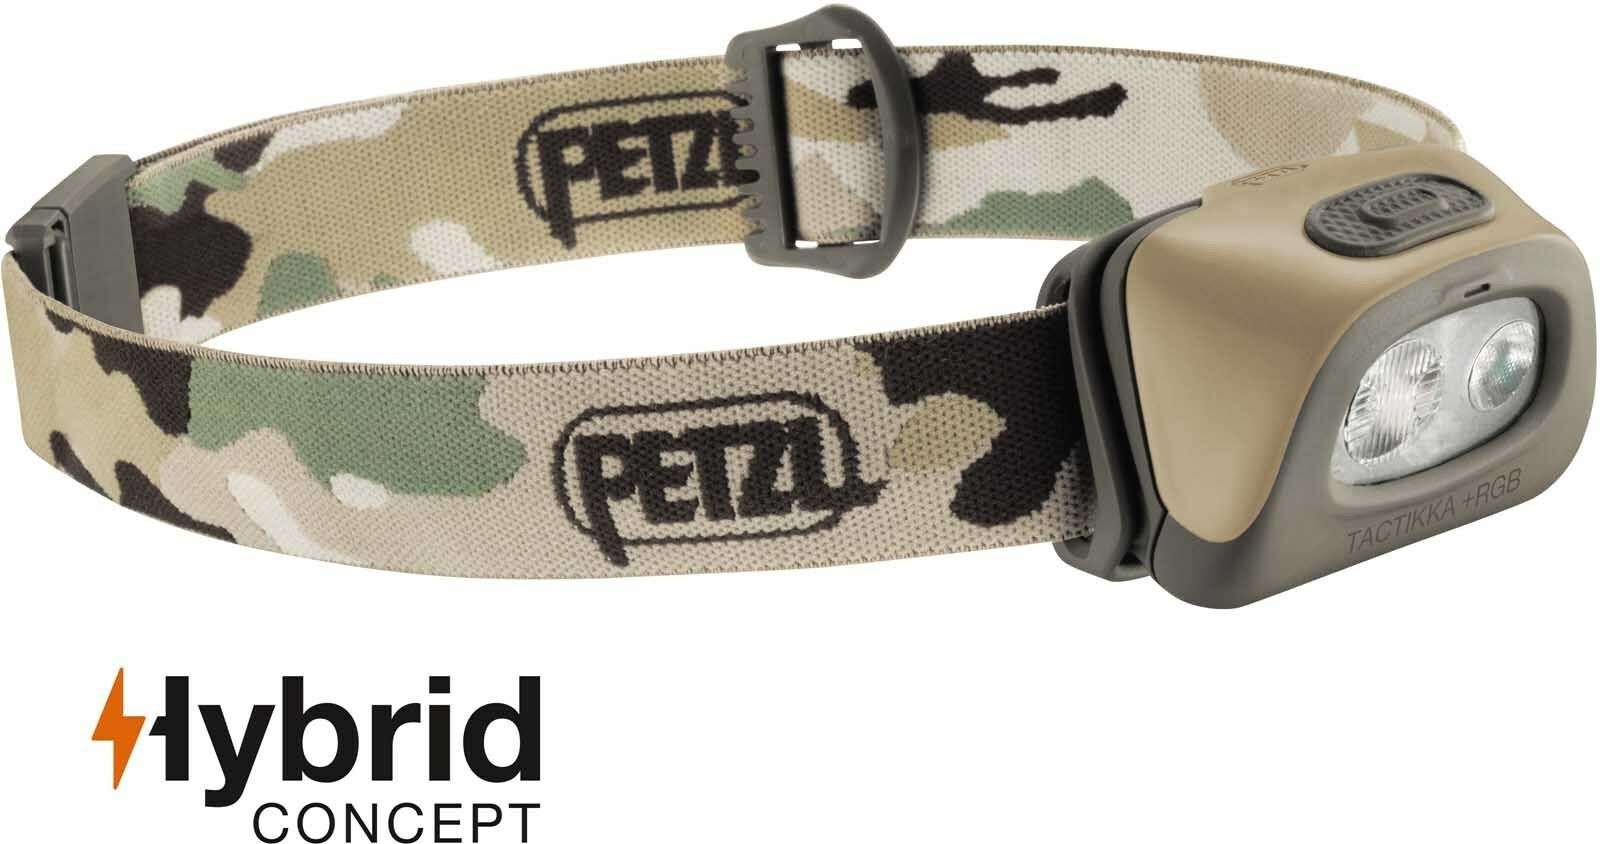 Petzl Camping Tactikka + RGB 250 Lumens Outdoor Camping Petzl / Hunting Head lamp Torch 30c029